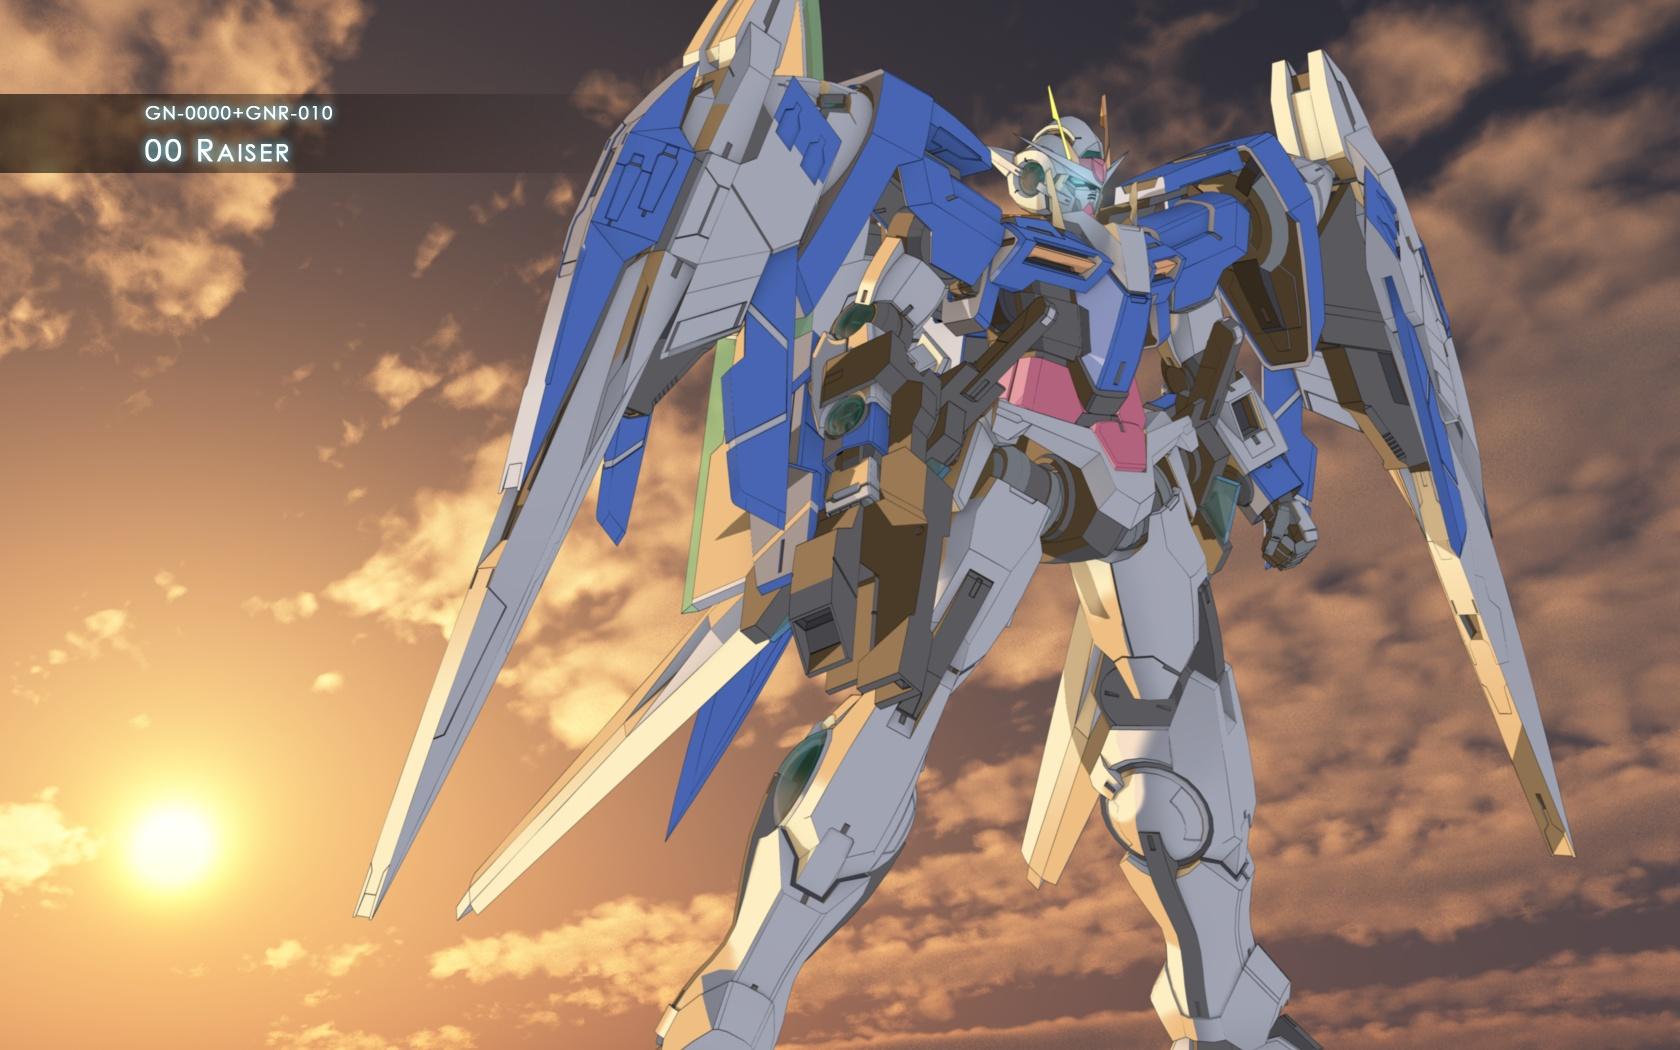 Mobile Suit Gundam 00 Wallpaper 185520 Zerochan Anime Image Board